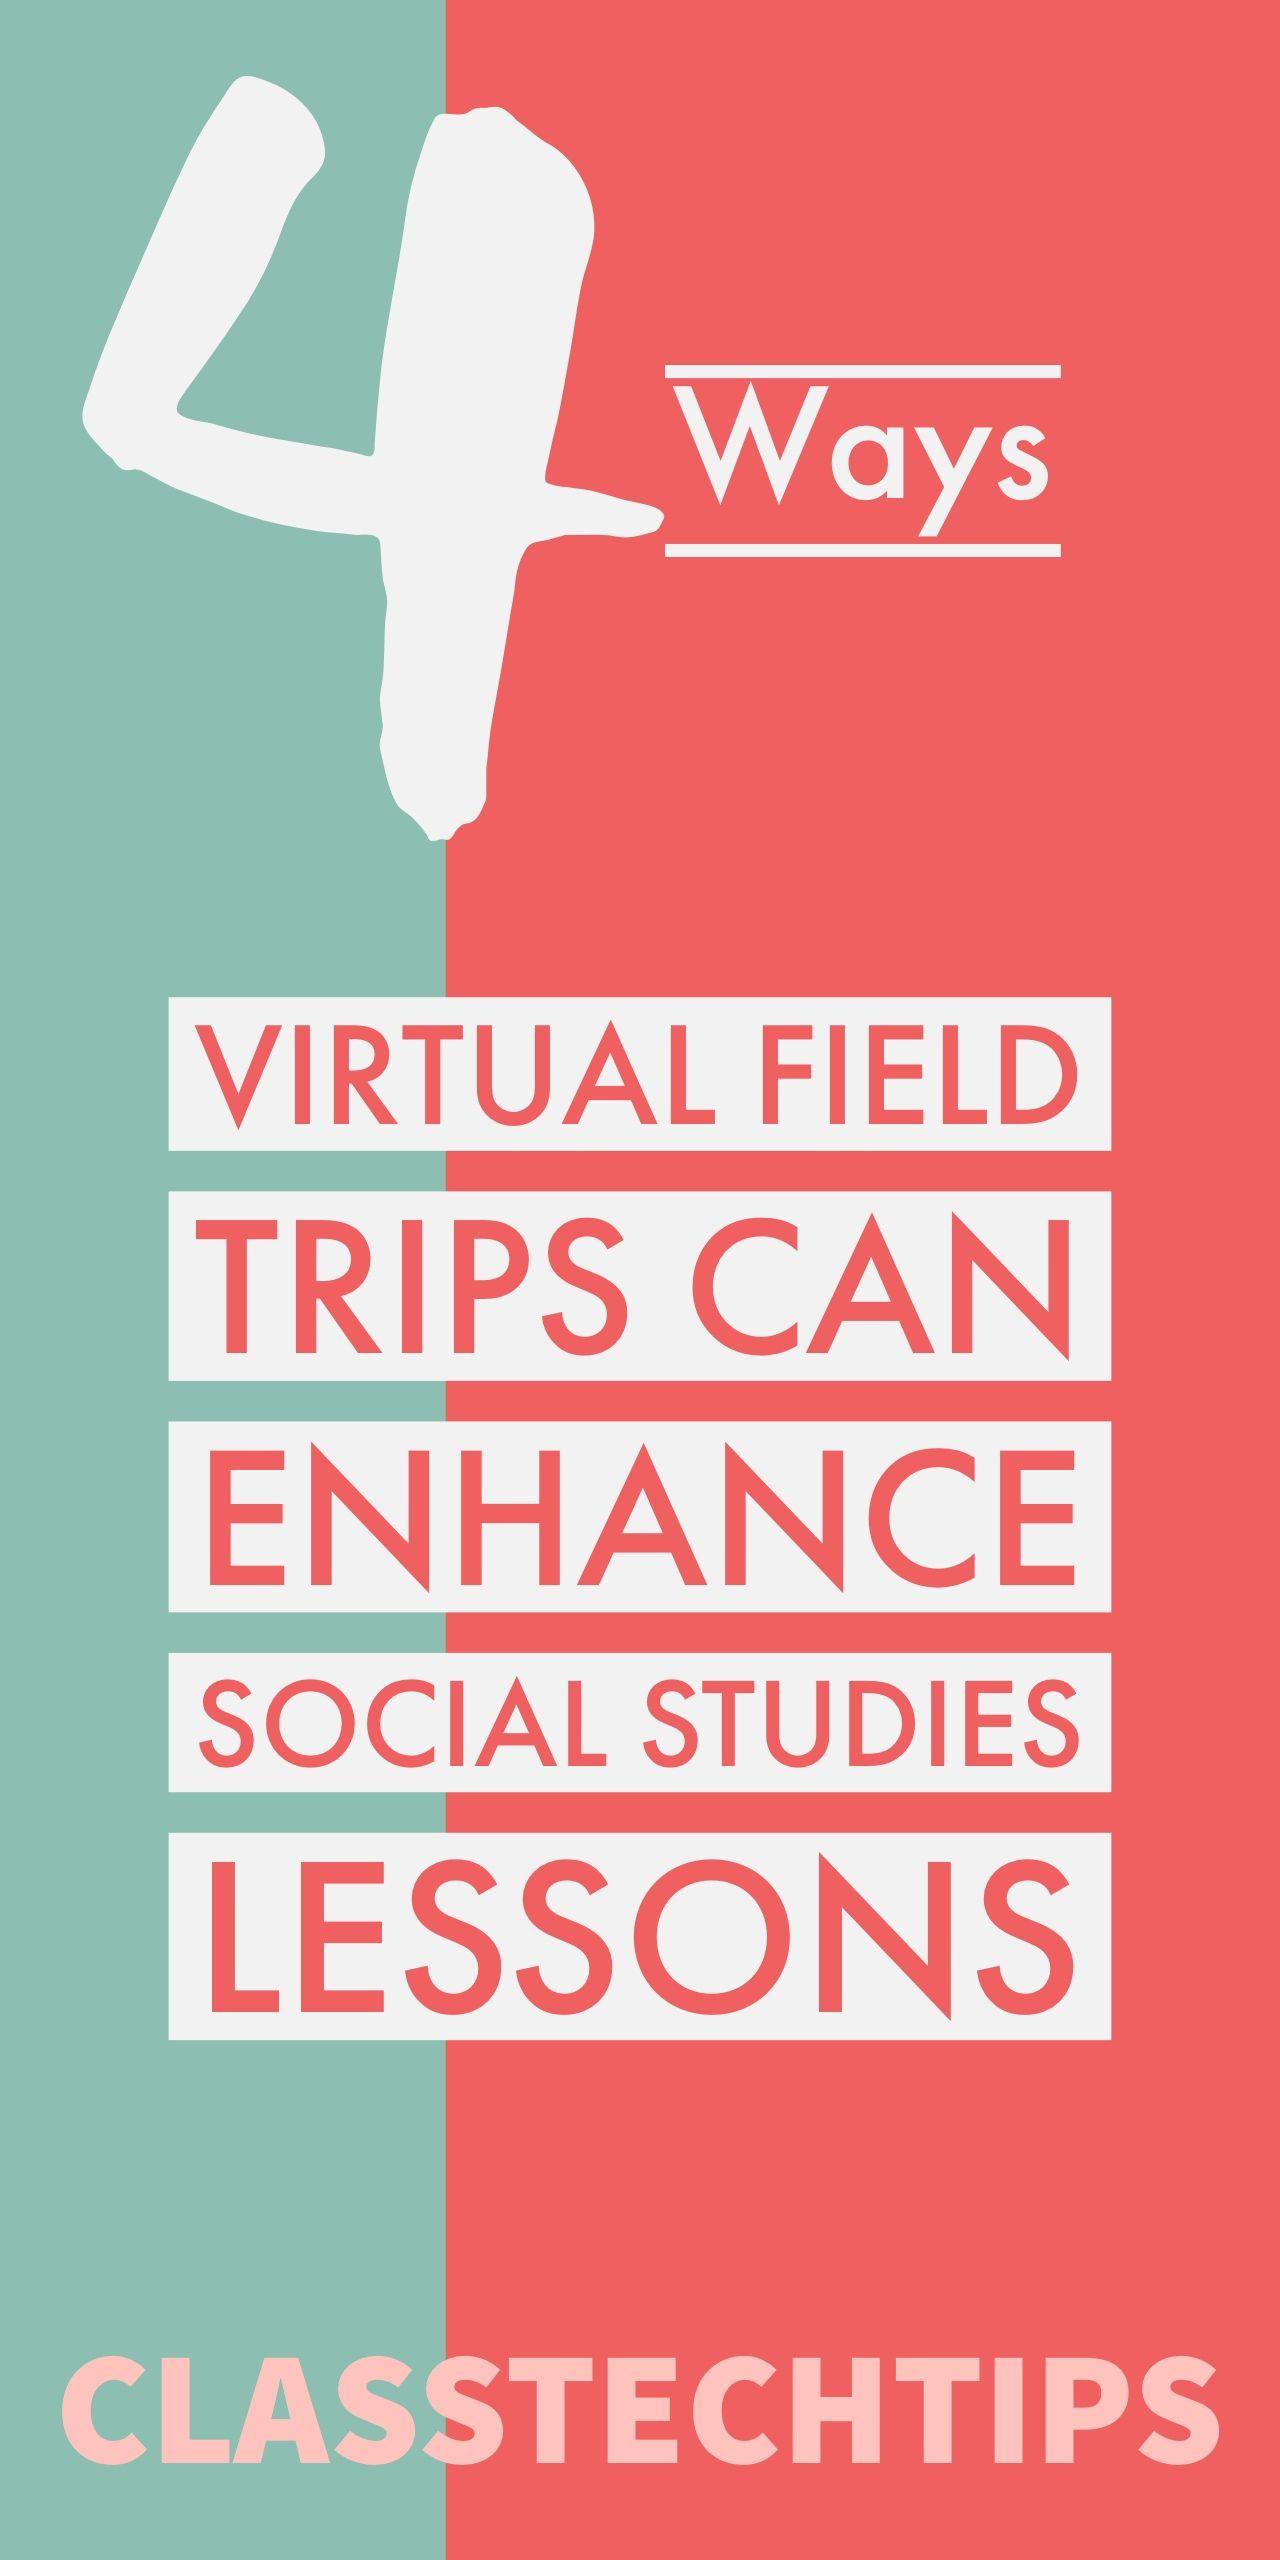 4 Ways Virtual Field Trips Can Enhance Social Stu S